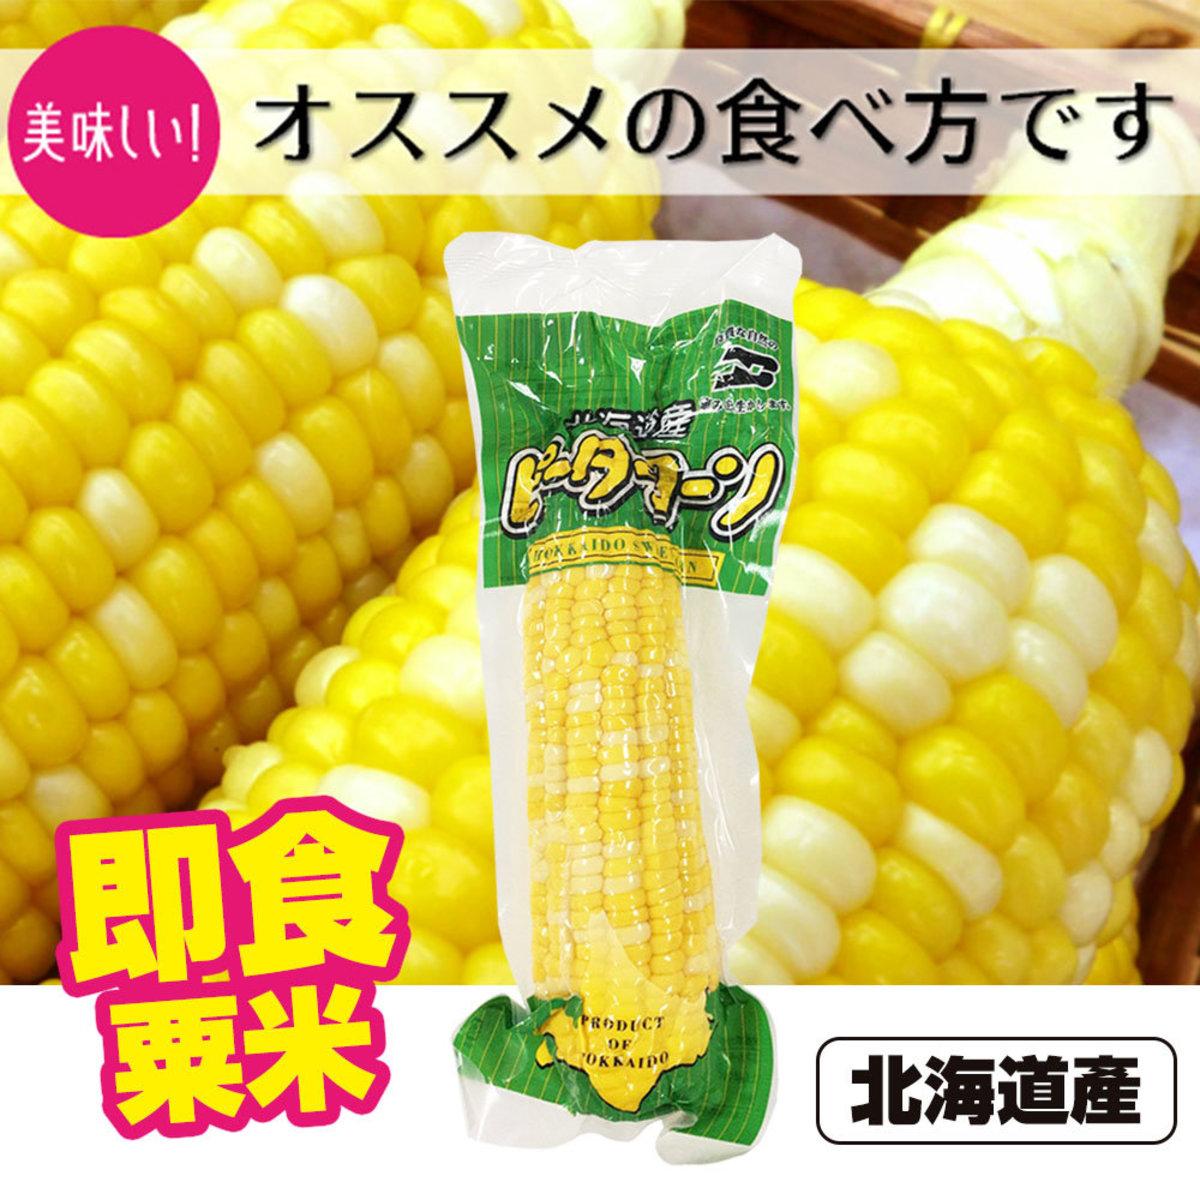 Hokkaido Sweet Corn